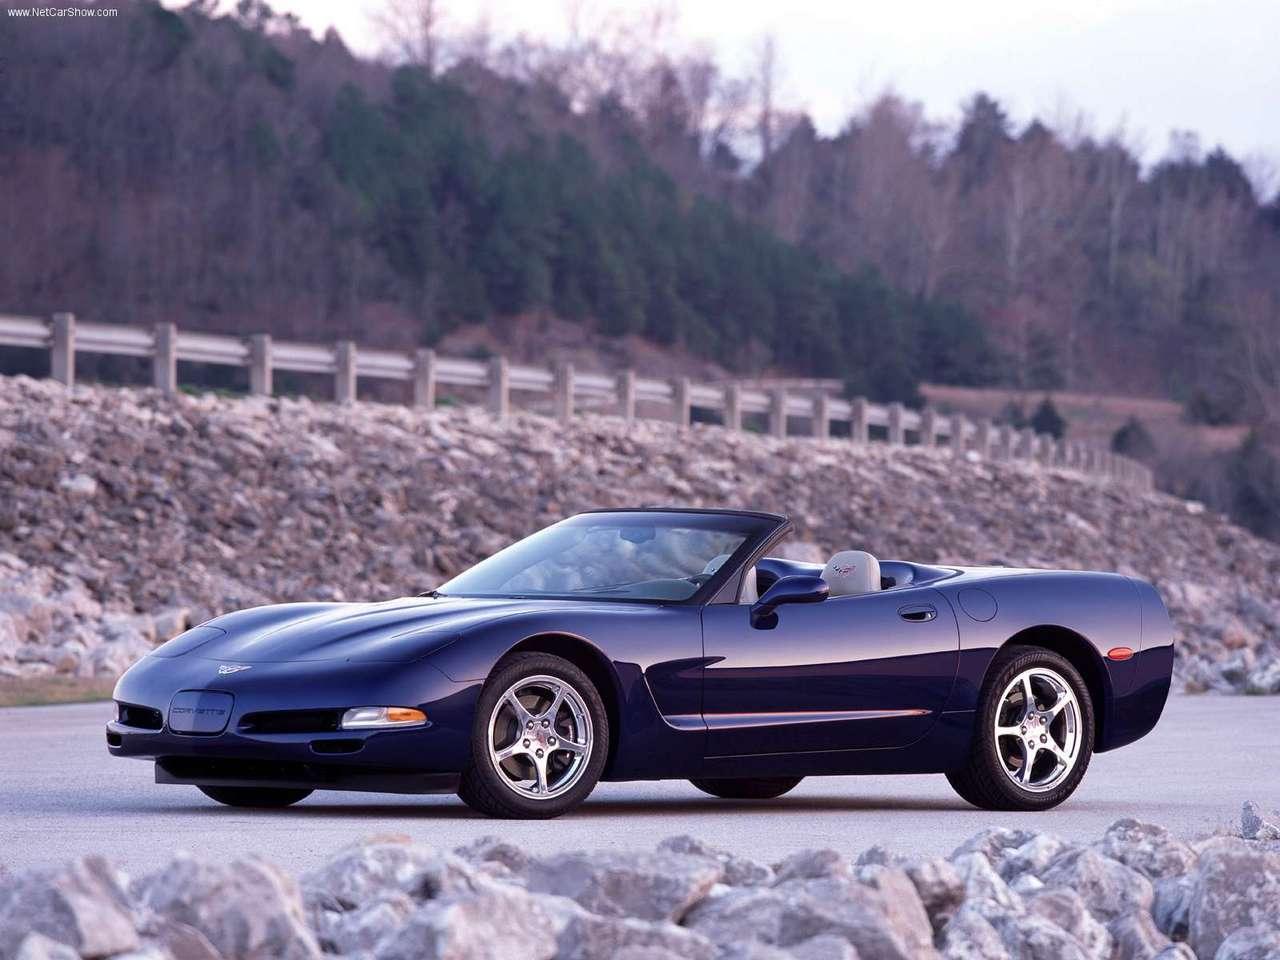 http://3.bp.blogspot.com/-wuYV78mMmMw/TYZxtEW6JJI/AAAAAAAAN50/iOW0Uyz_vsc/s1600/Chevrolet-Corvette_2003_1280x960_wallpaper_03.jpg